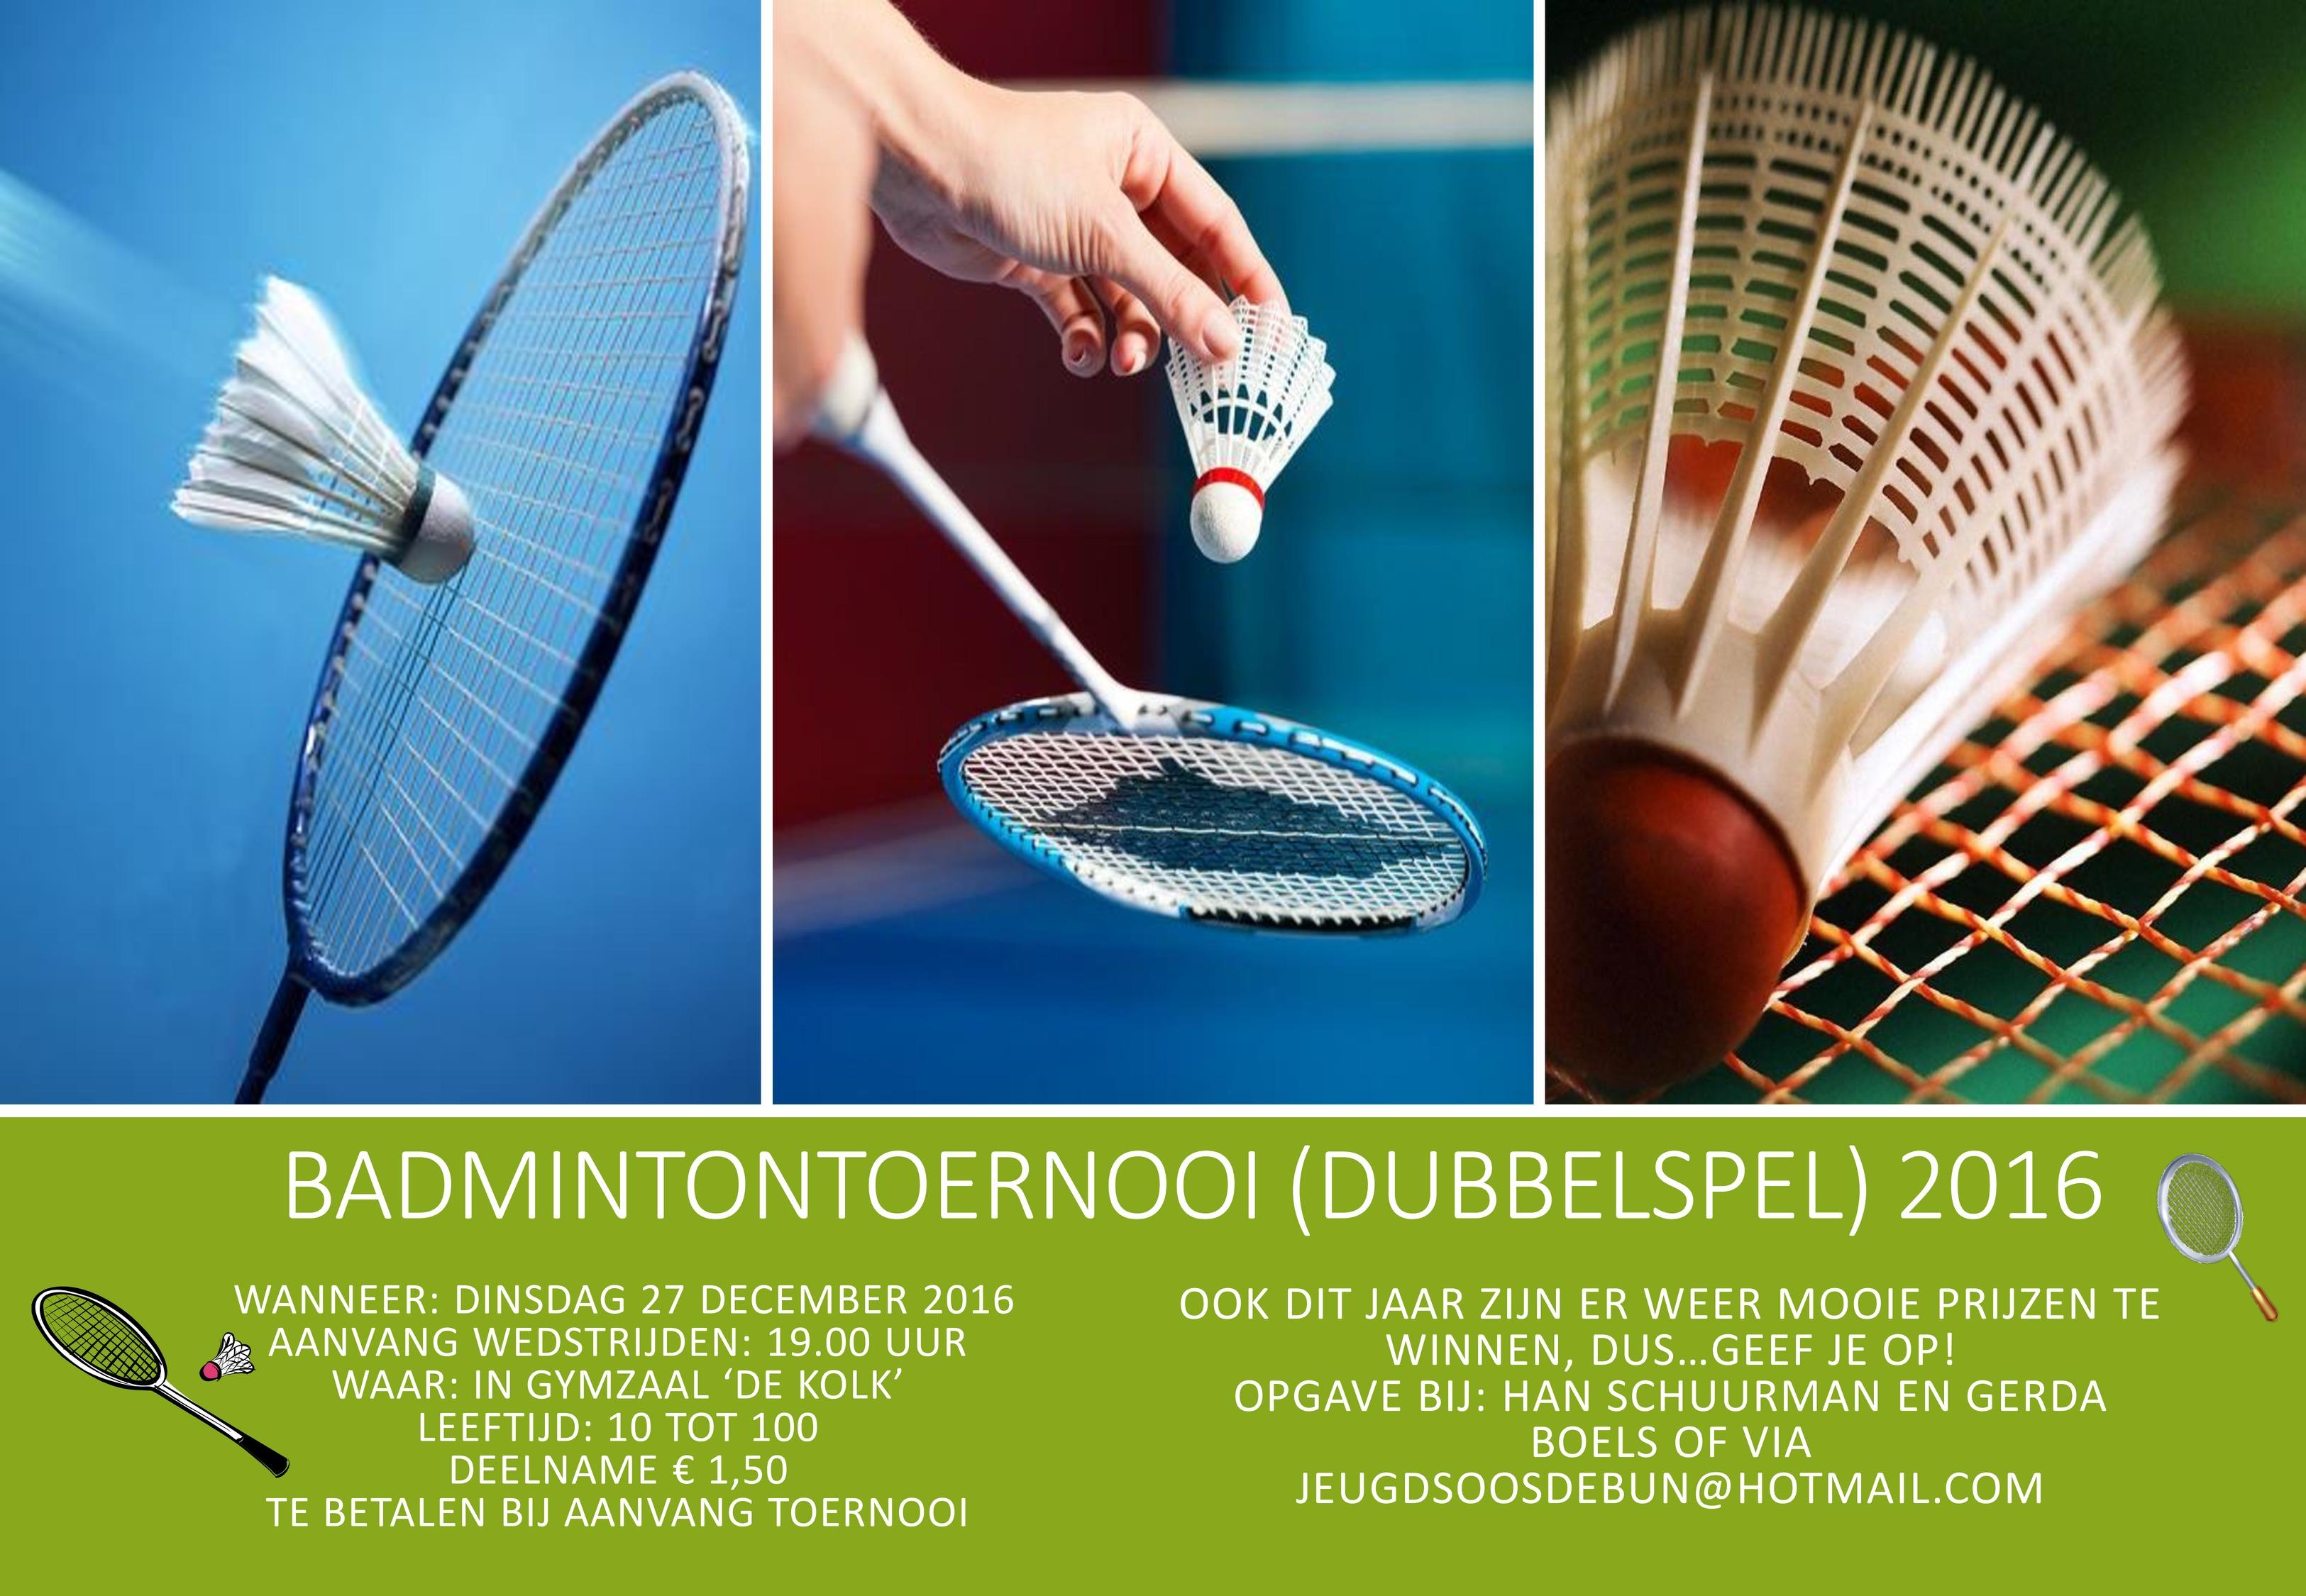 badmintontoernooi_dubbelspel_2016-page0